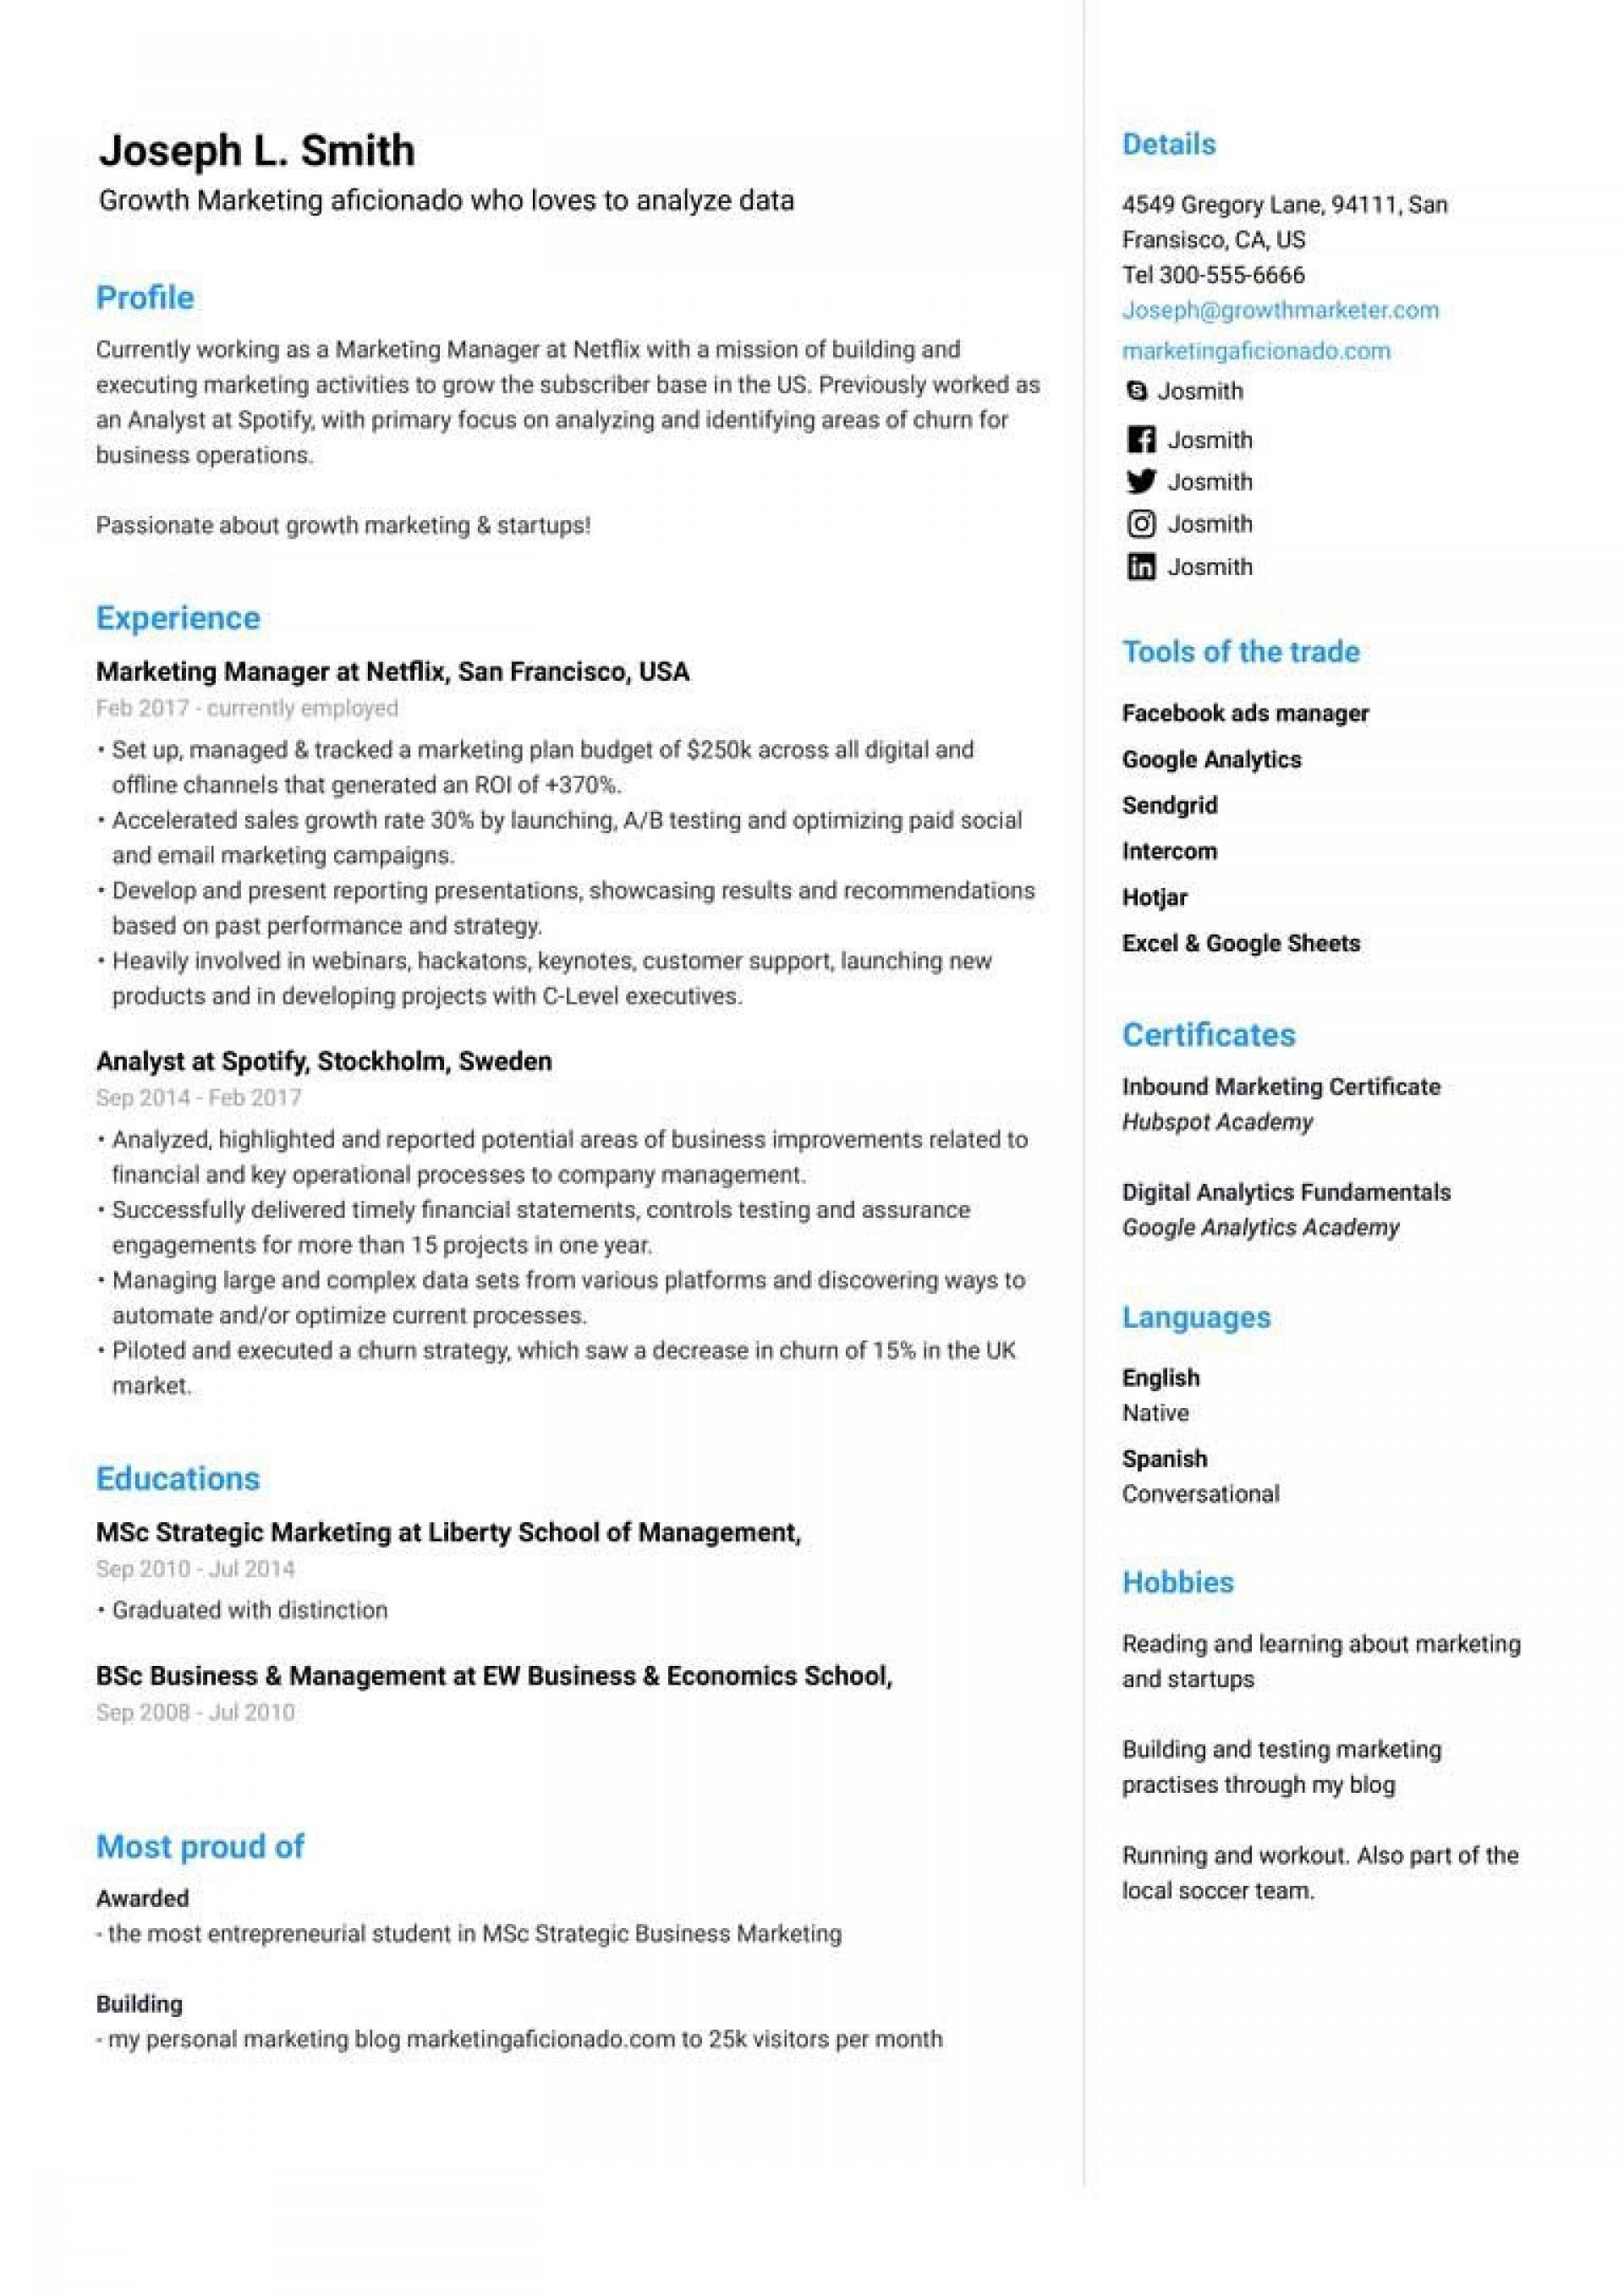 007 Wondrou Curriculum Vitae Template Free Picture  Sample Download Pdf Google Doc1920